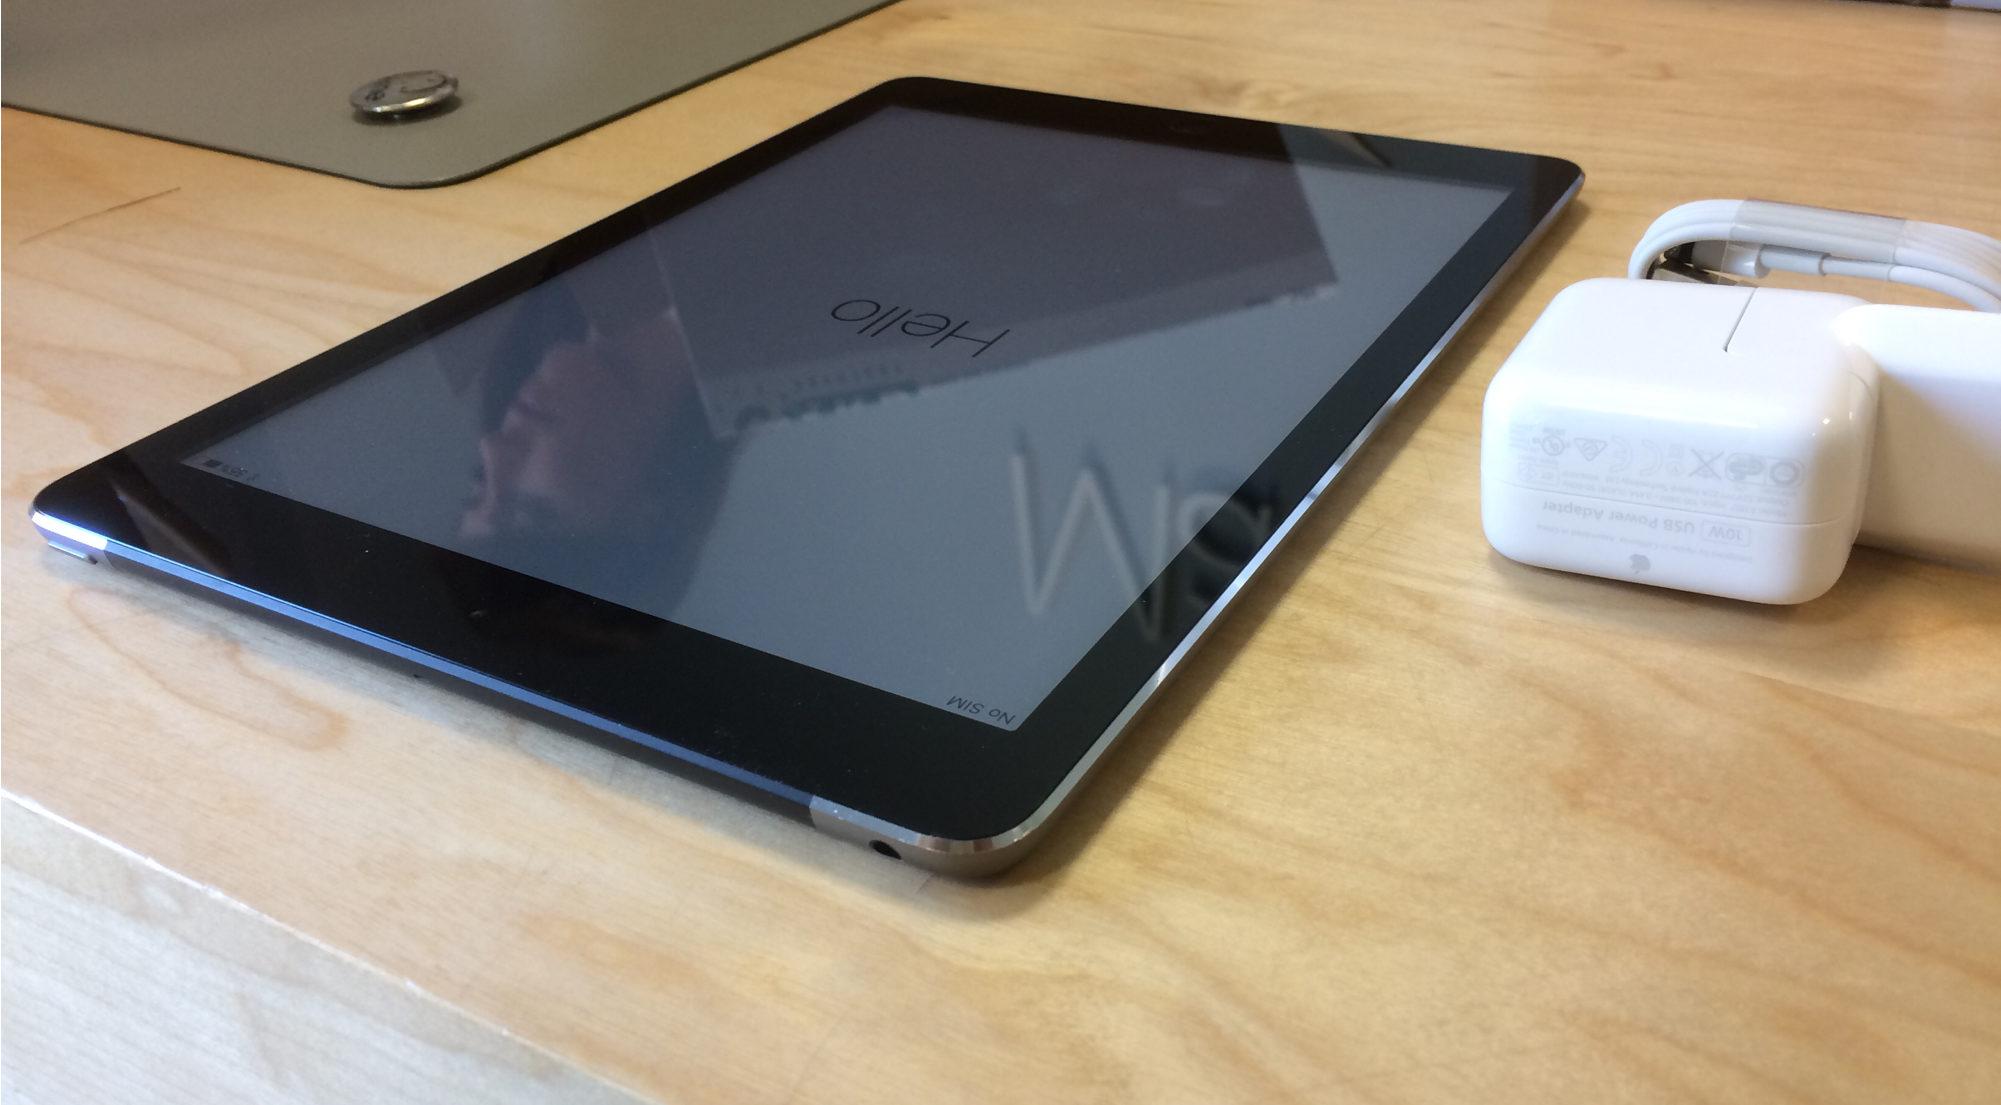 iPad Air (Wi-Fi + 4G), 64 GB, Space Gray, imagen 6